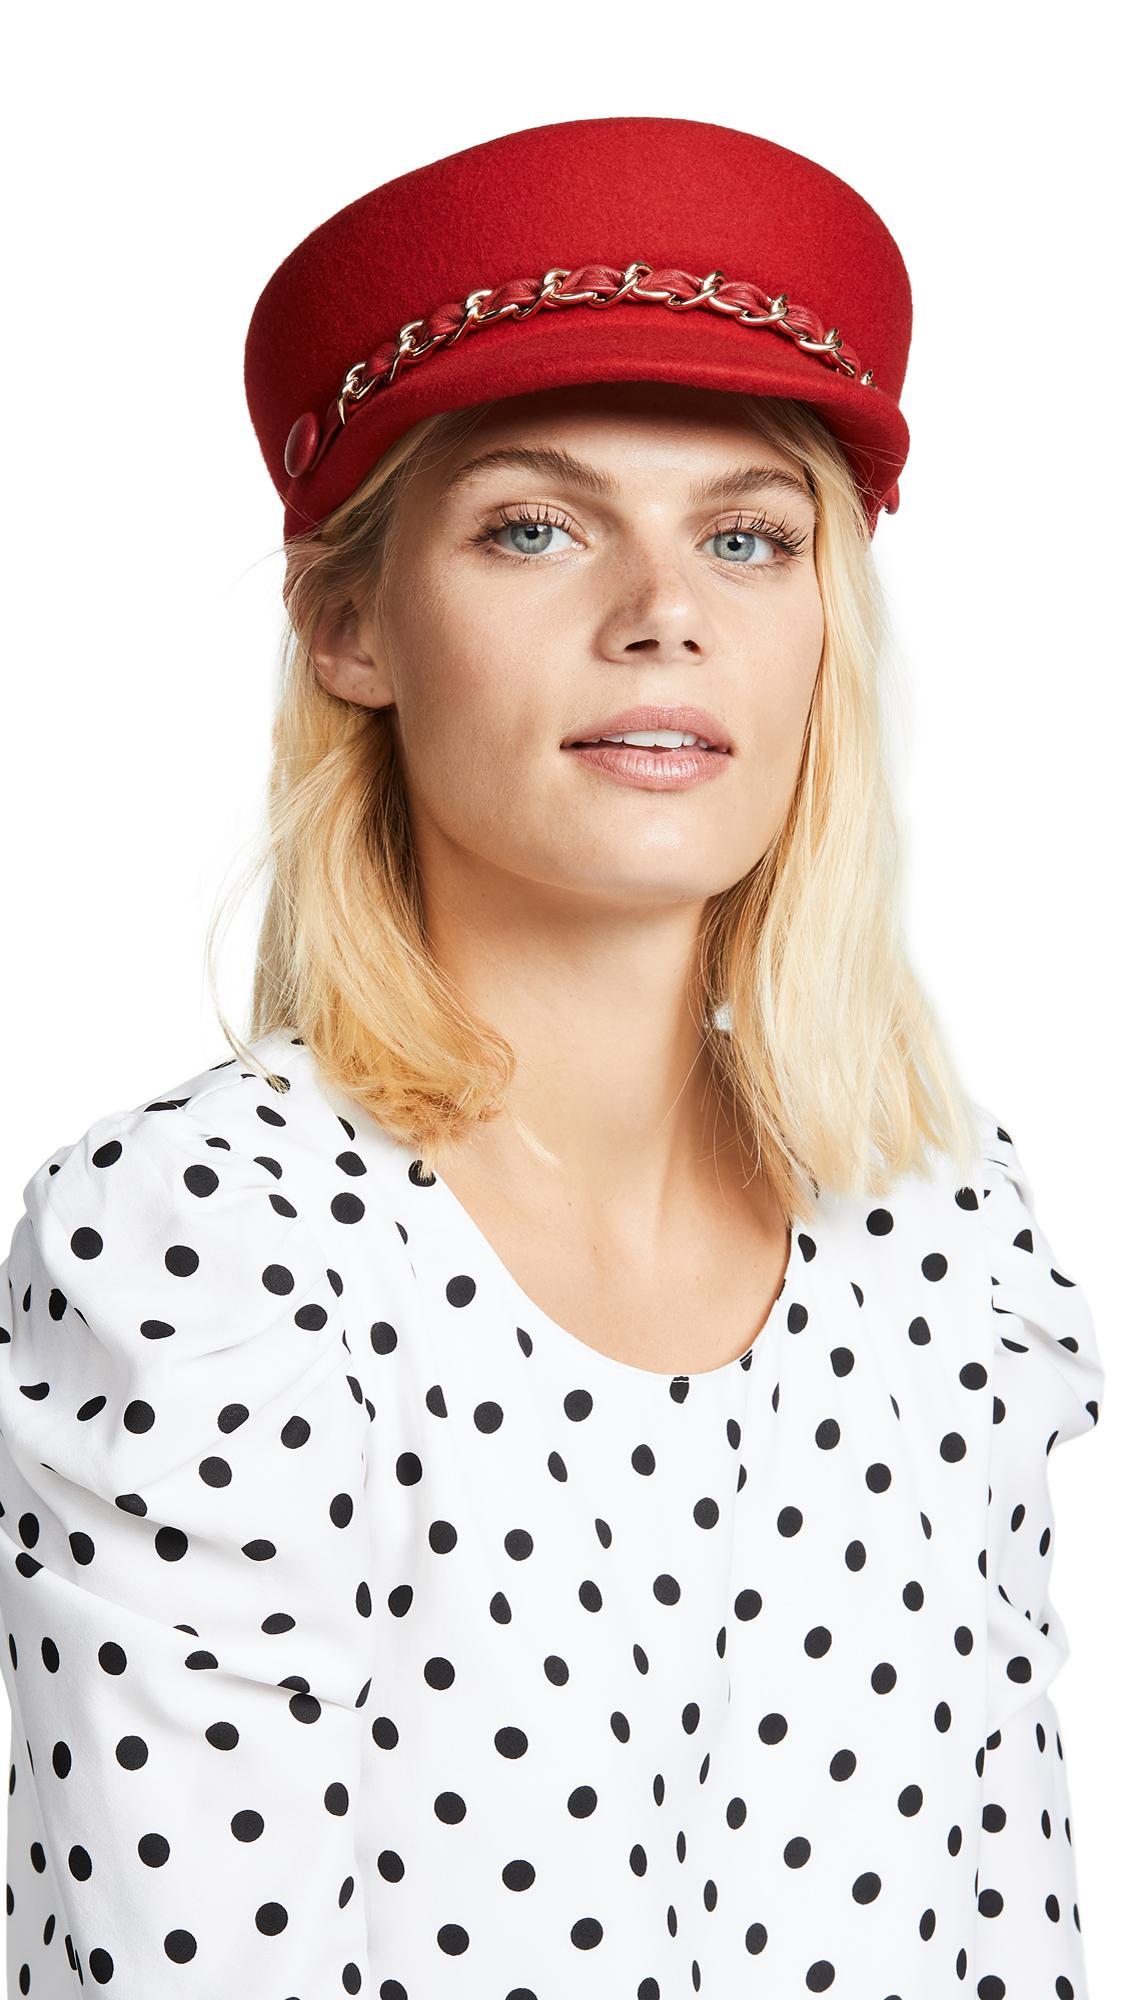 d4d432f6e64 Eugenia Kim Sabrina Wool Baker Boy Cap - Red